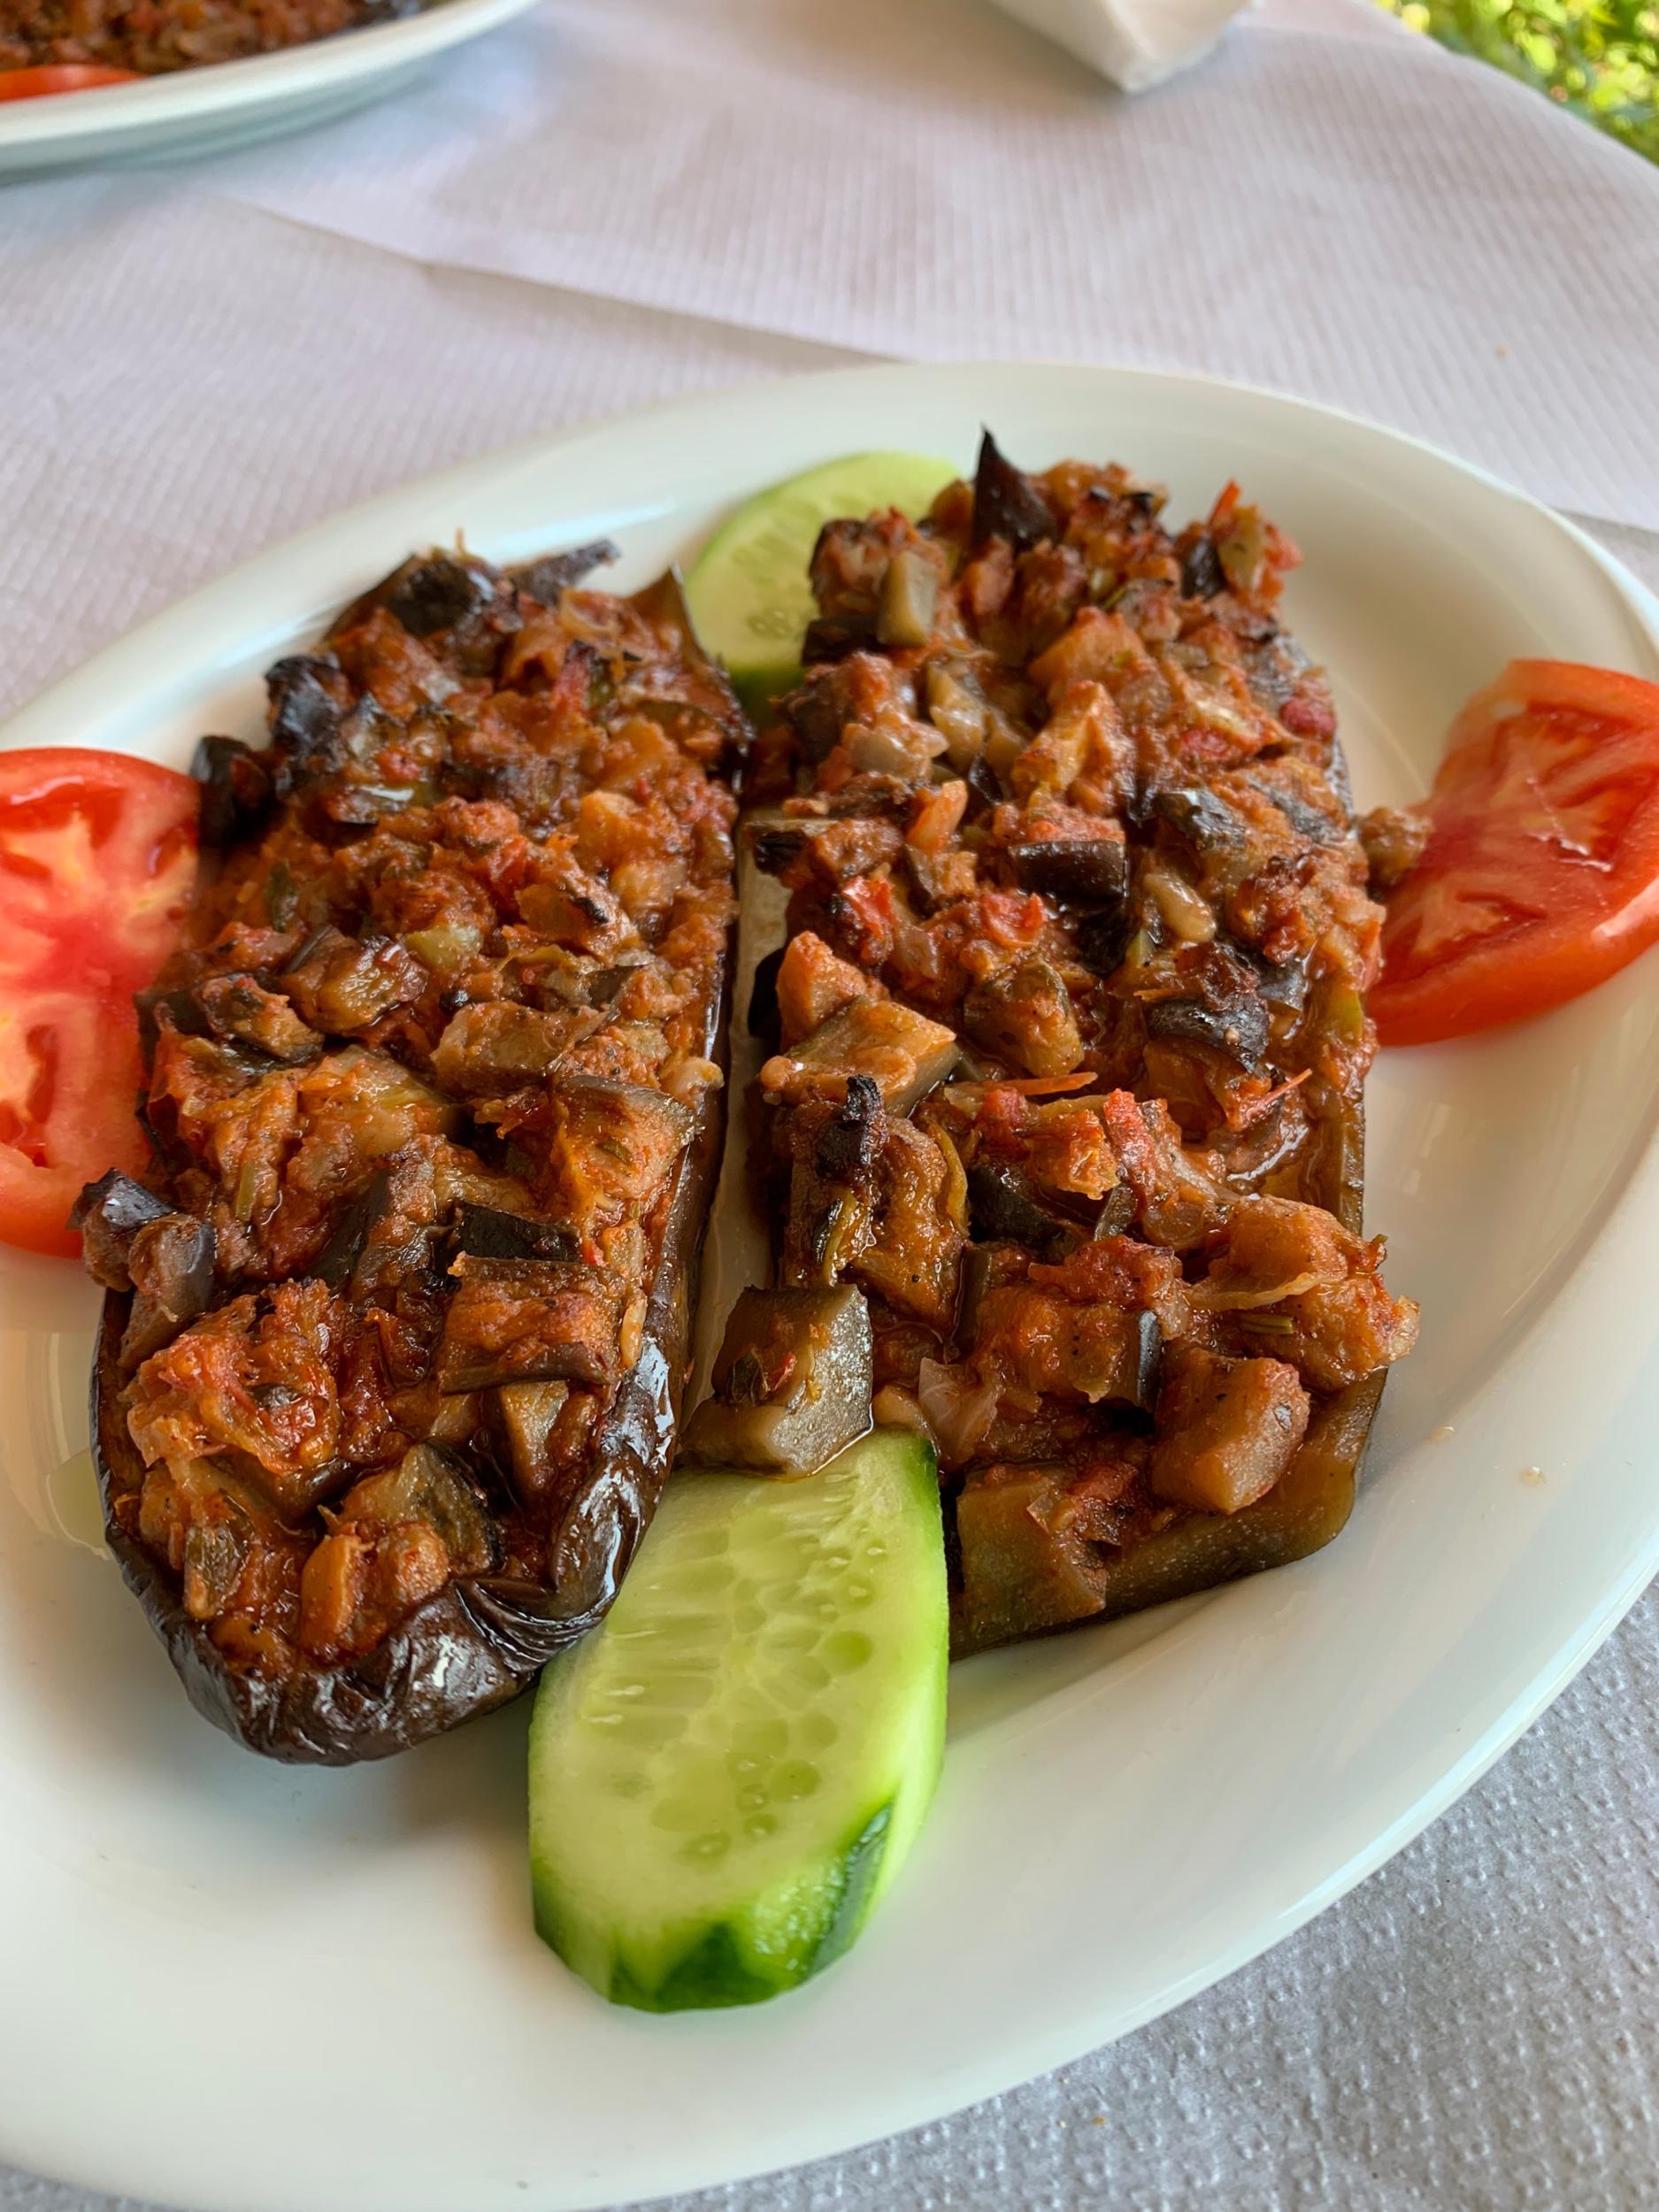 You'll find stuffed eggplant on many menus in Albania.